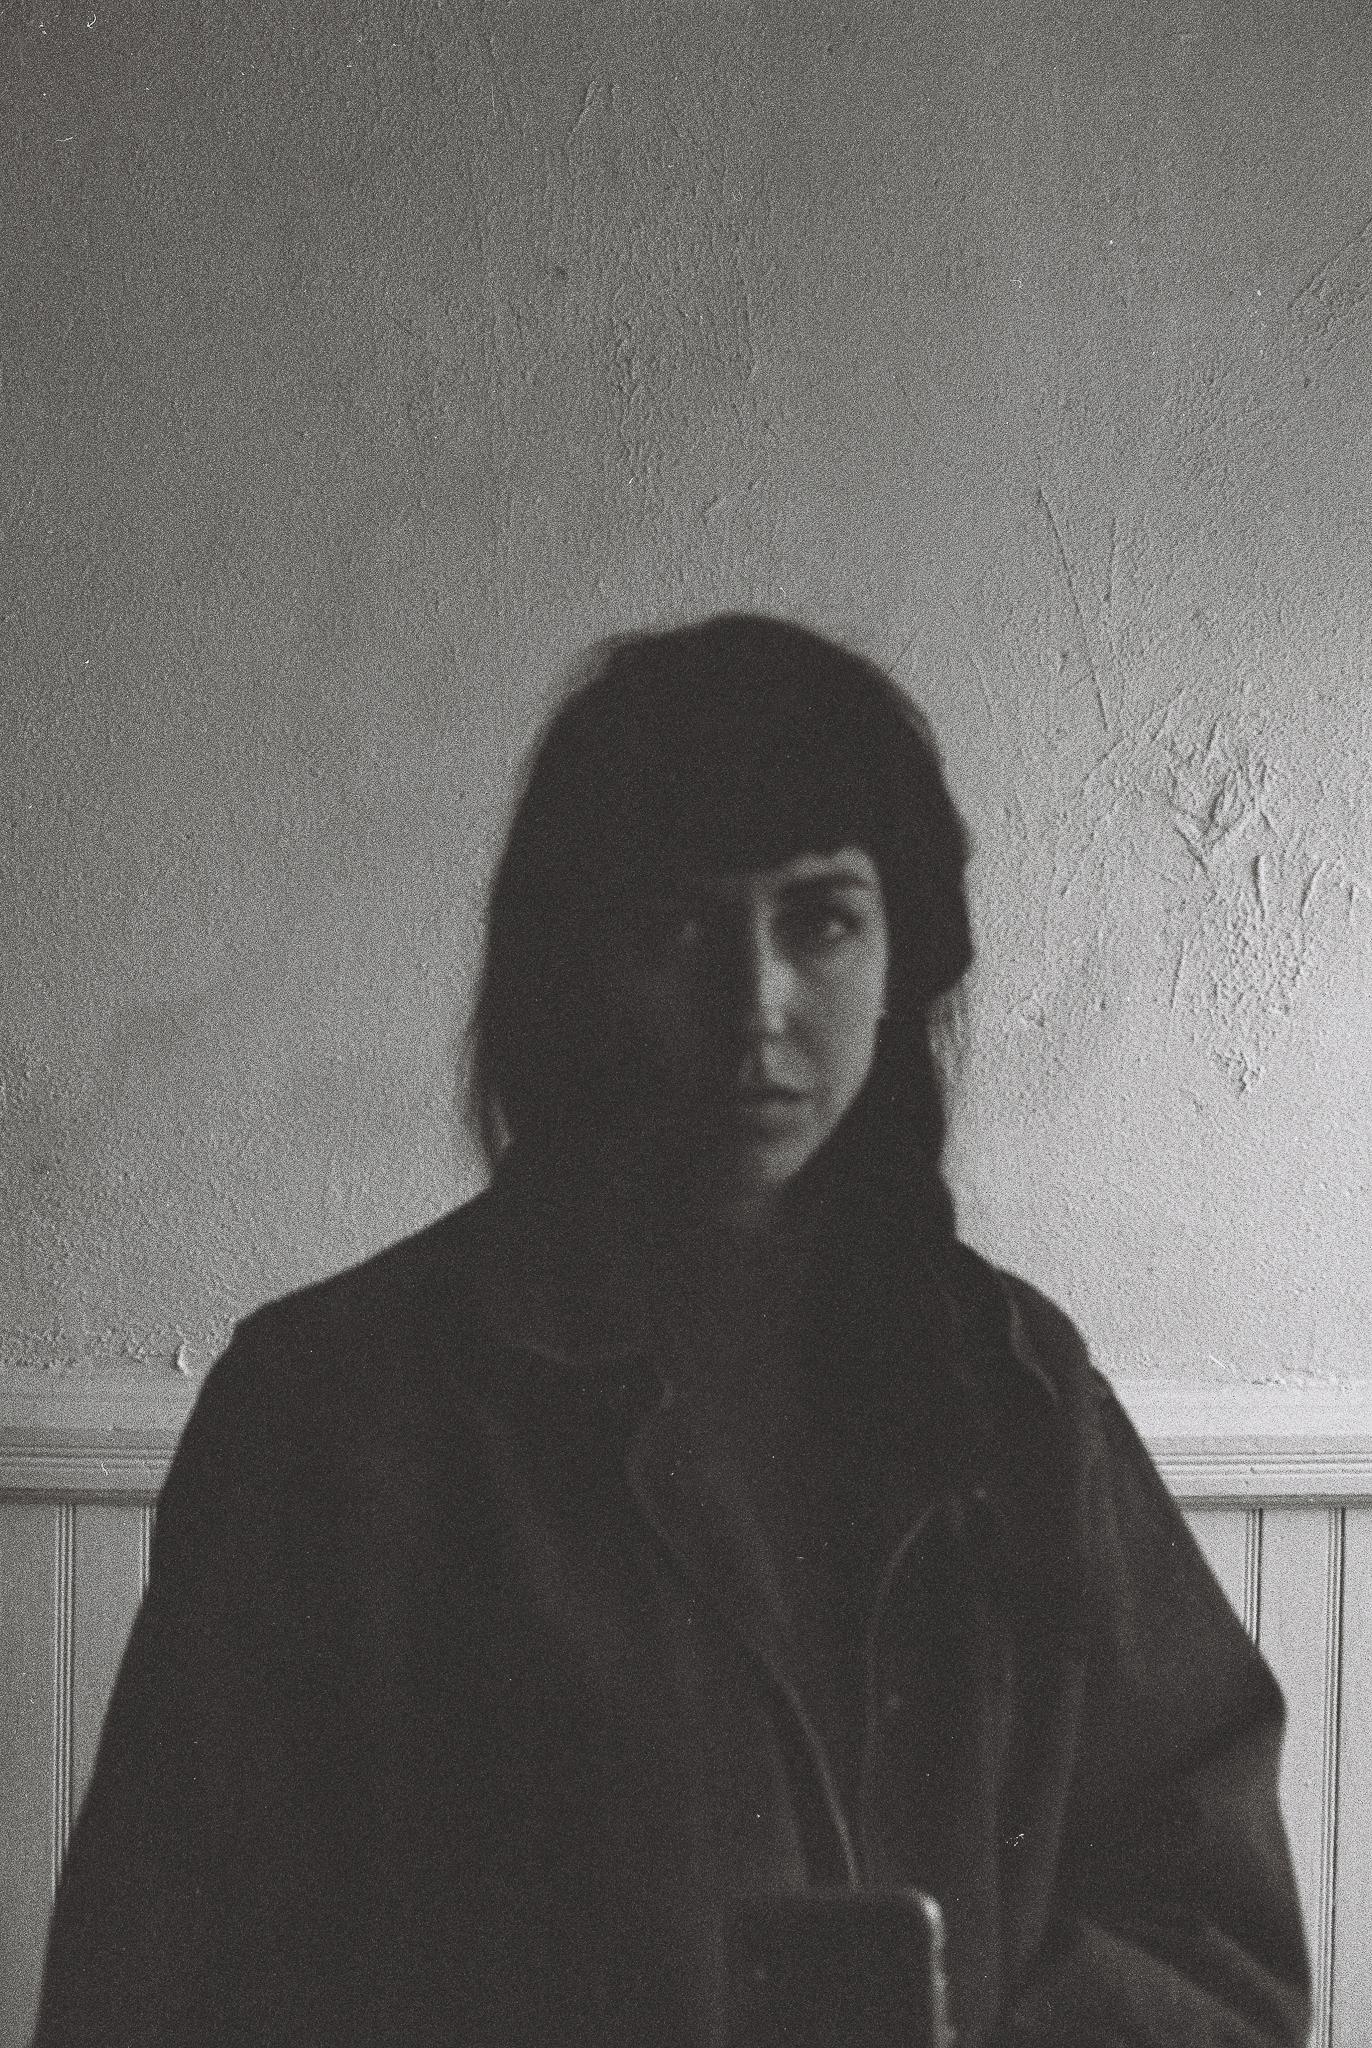 Analog Self Portrait, Nienke Izurieta